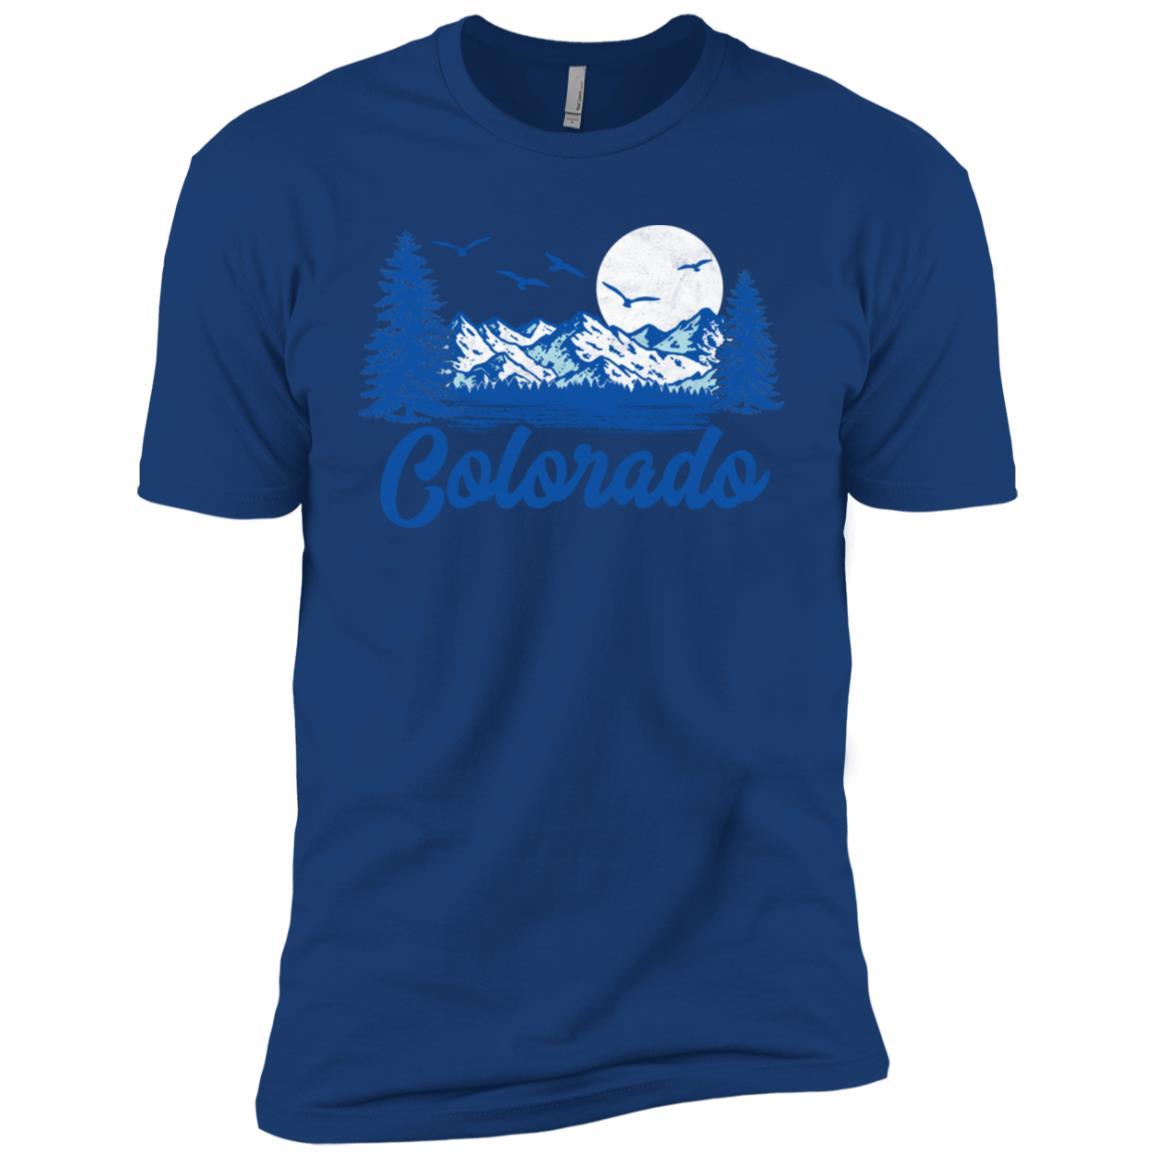 Retro Colorado Eighties Mountains Graphic Tee Men Short Sleeve T-Shirt